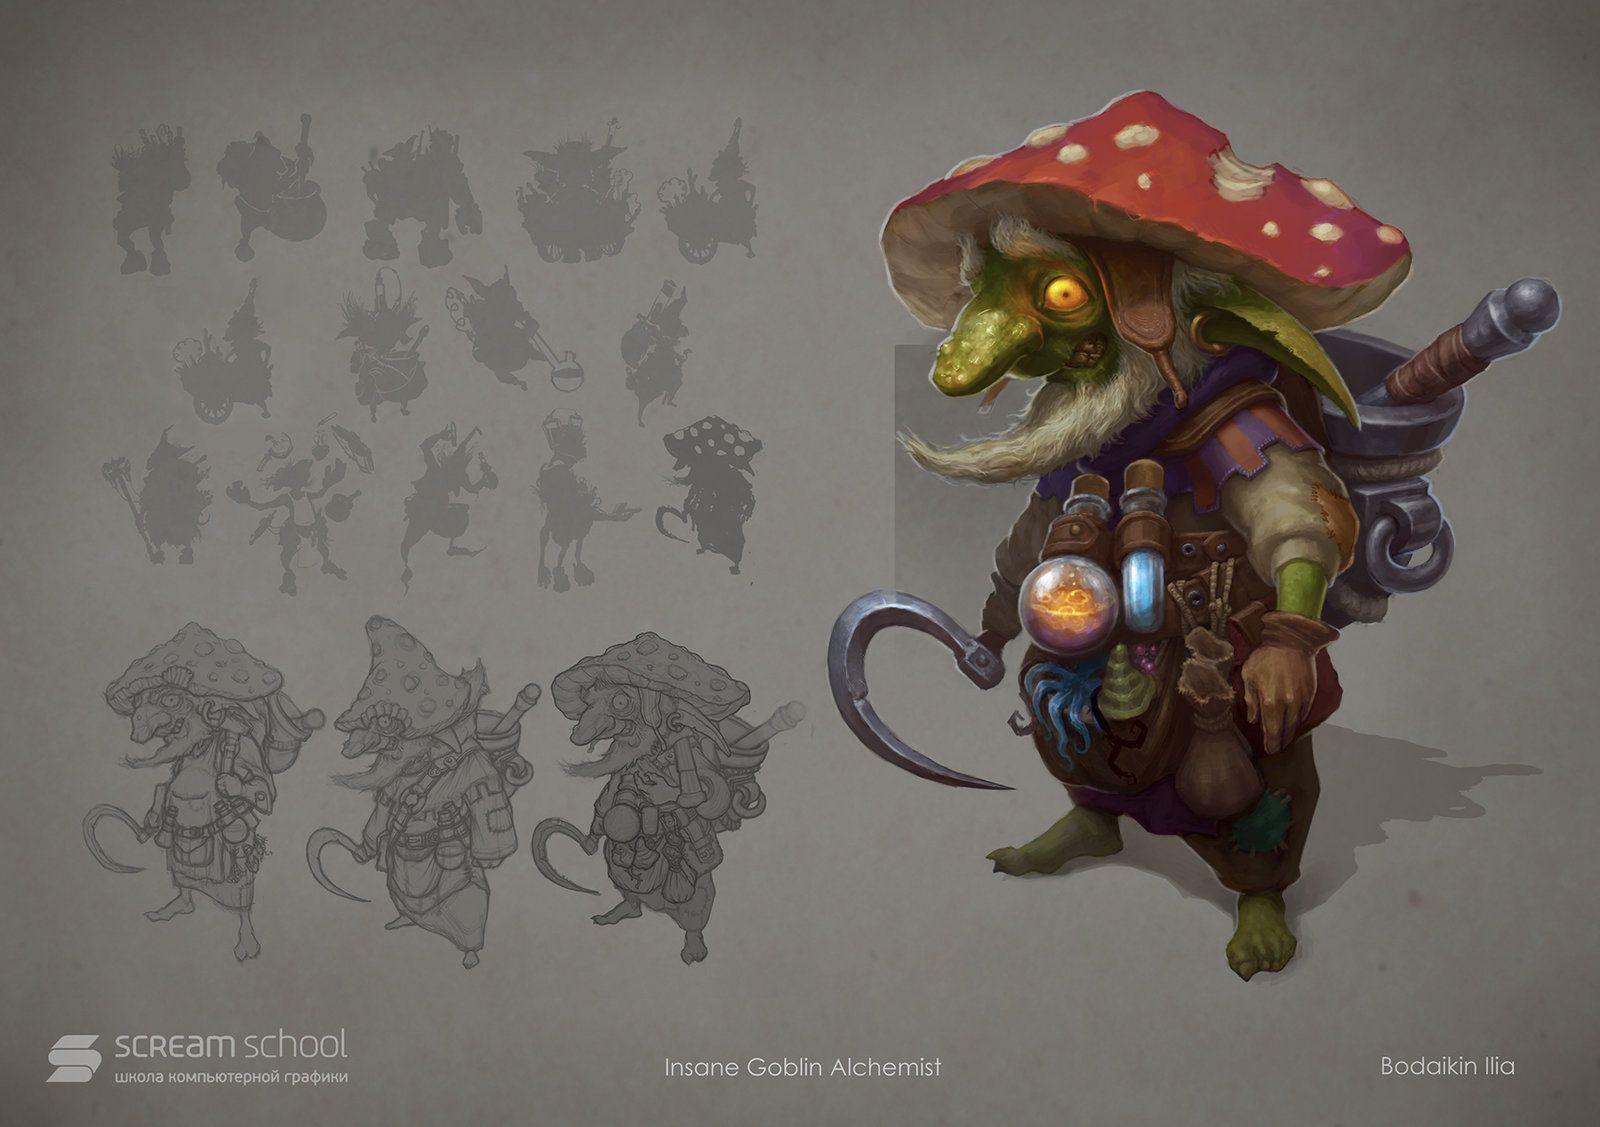 Goblin Alchemist, Ilya Bodaykin on ArtStation at https://www.artstation.com/artwork/goblin-alchemist